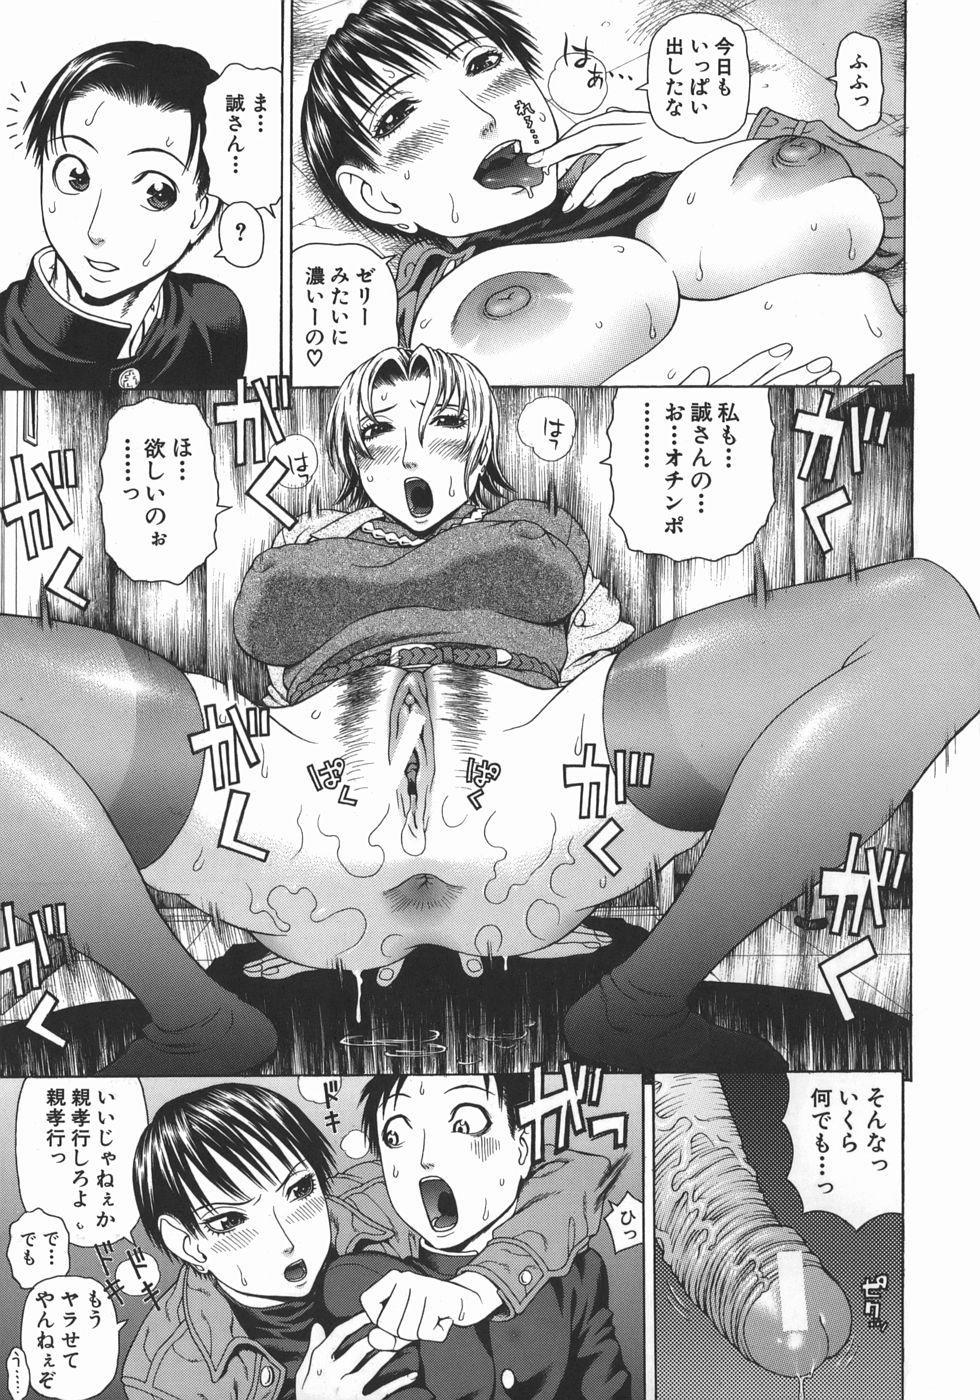 Ero Ane - The Erotic Elder Sister 182